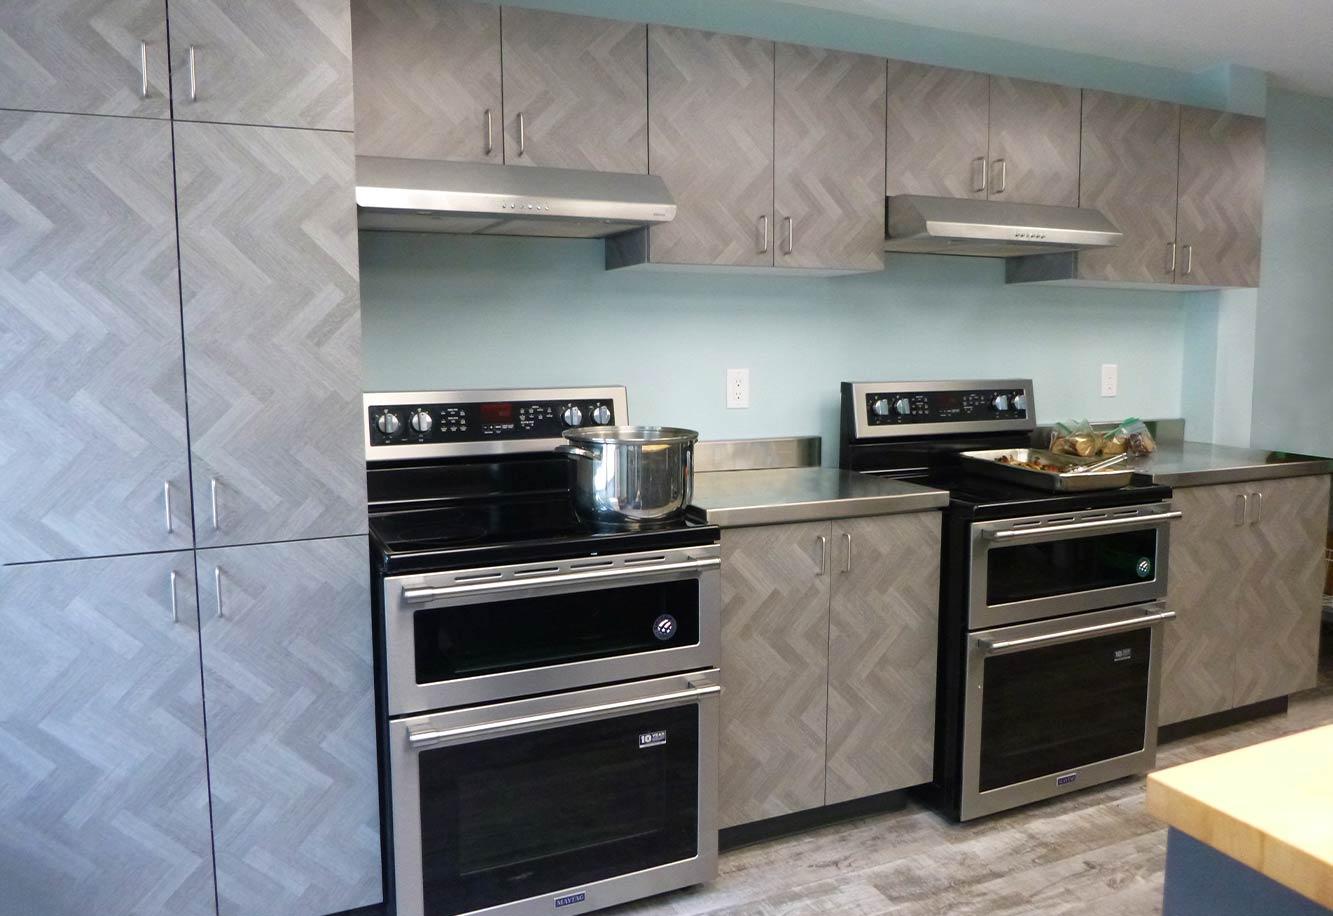 Cambridge Vineyard Fellowship - Kitchen Renovation Project Picture